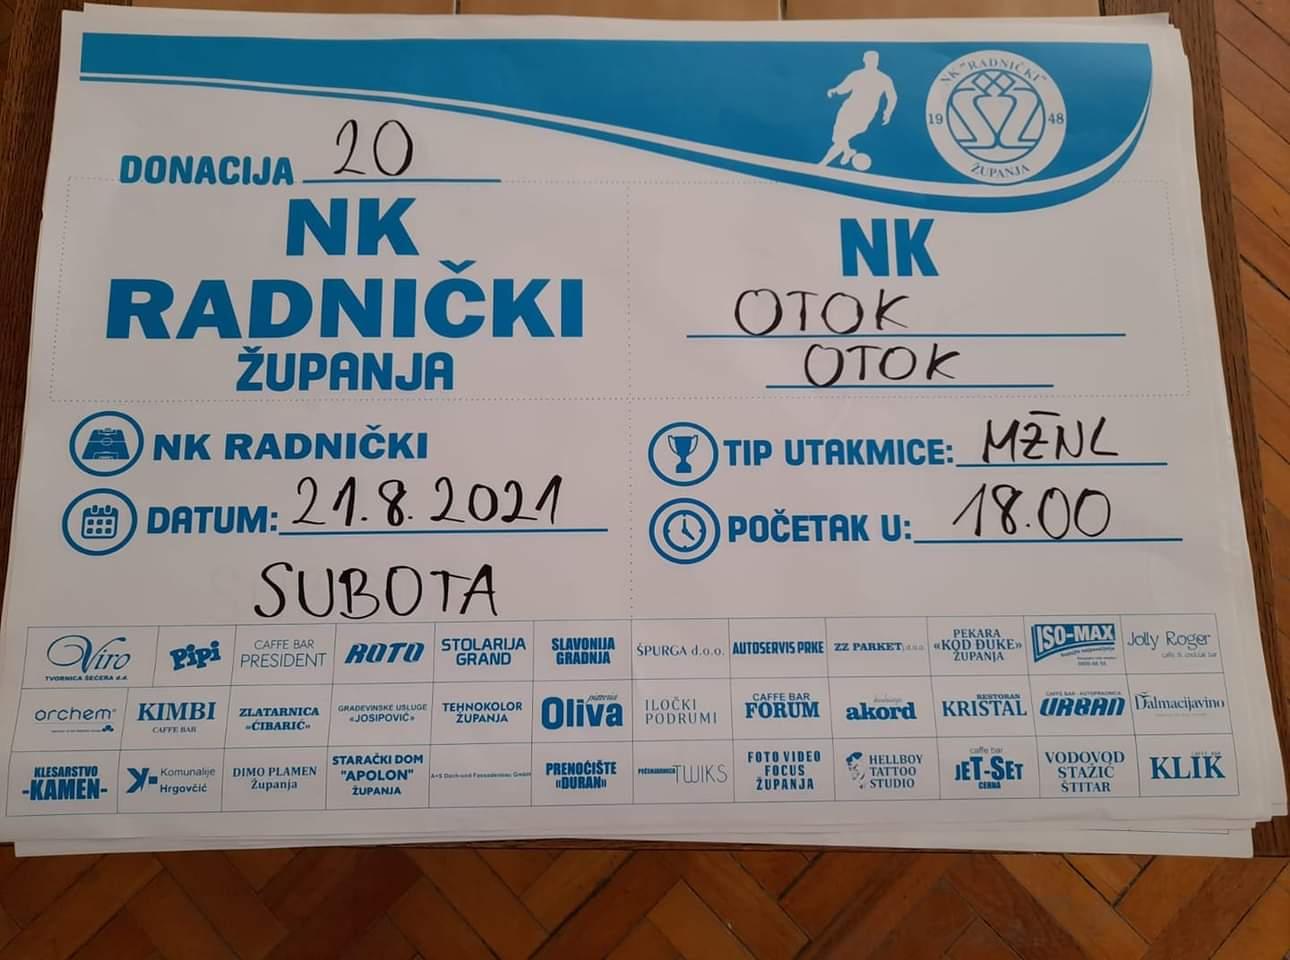 Sutra NK Radnički-NK Otok